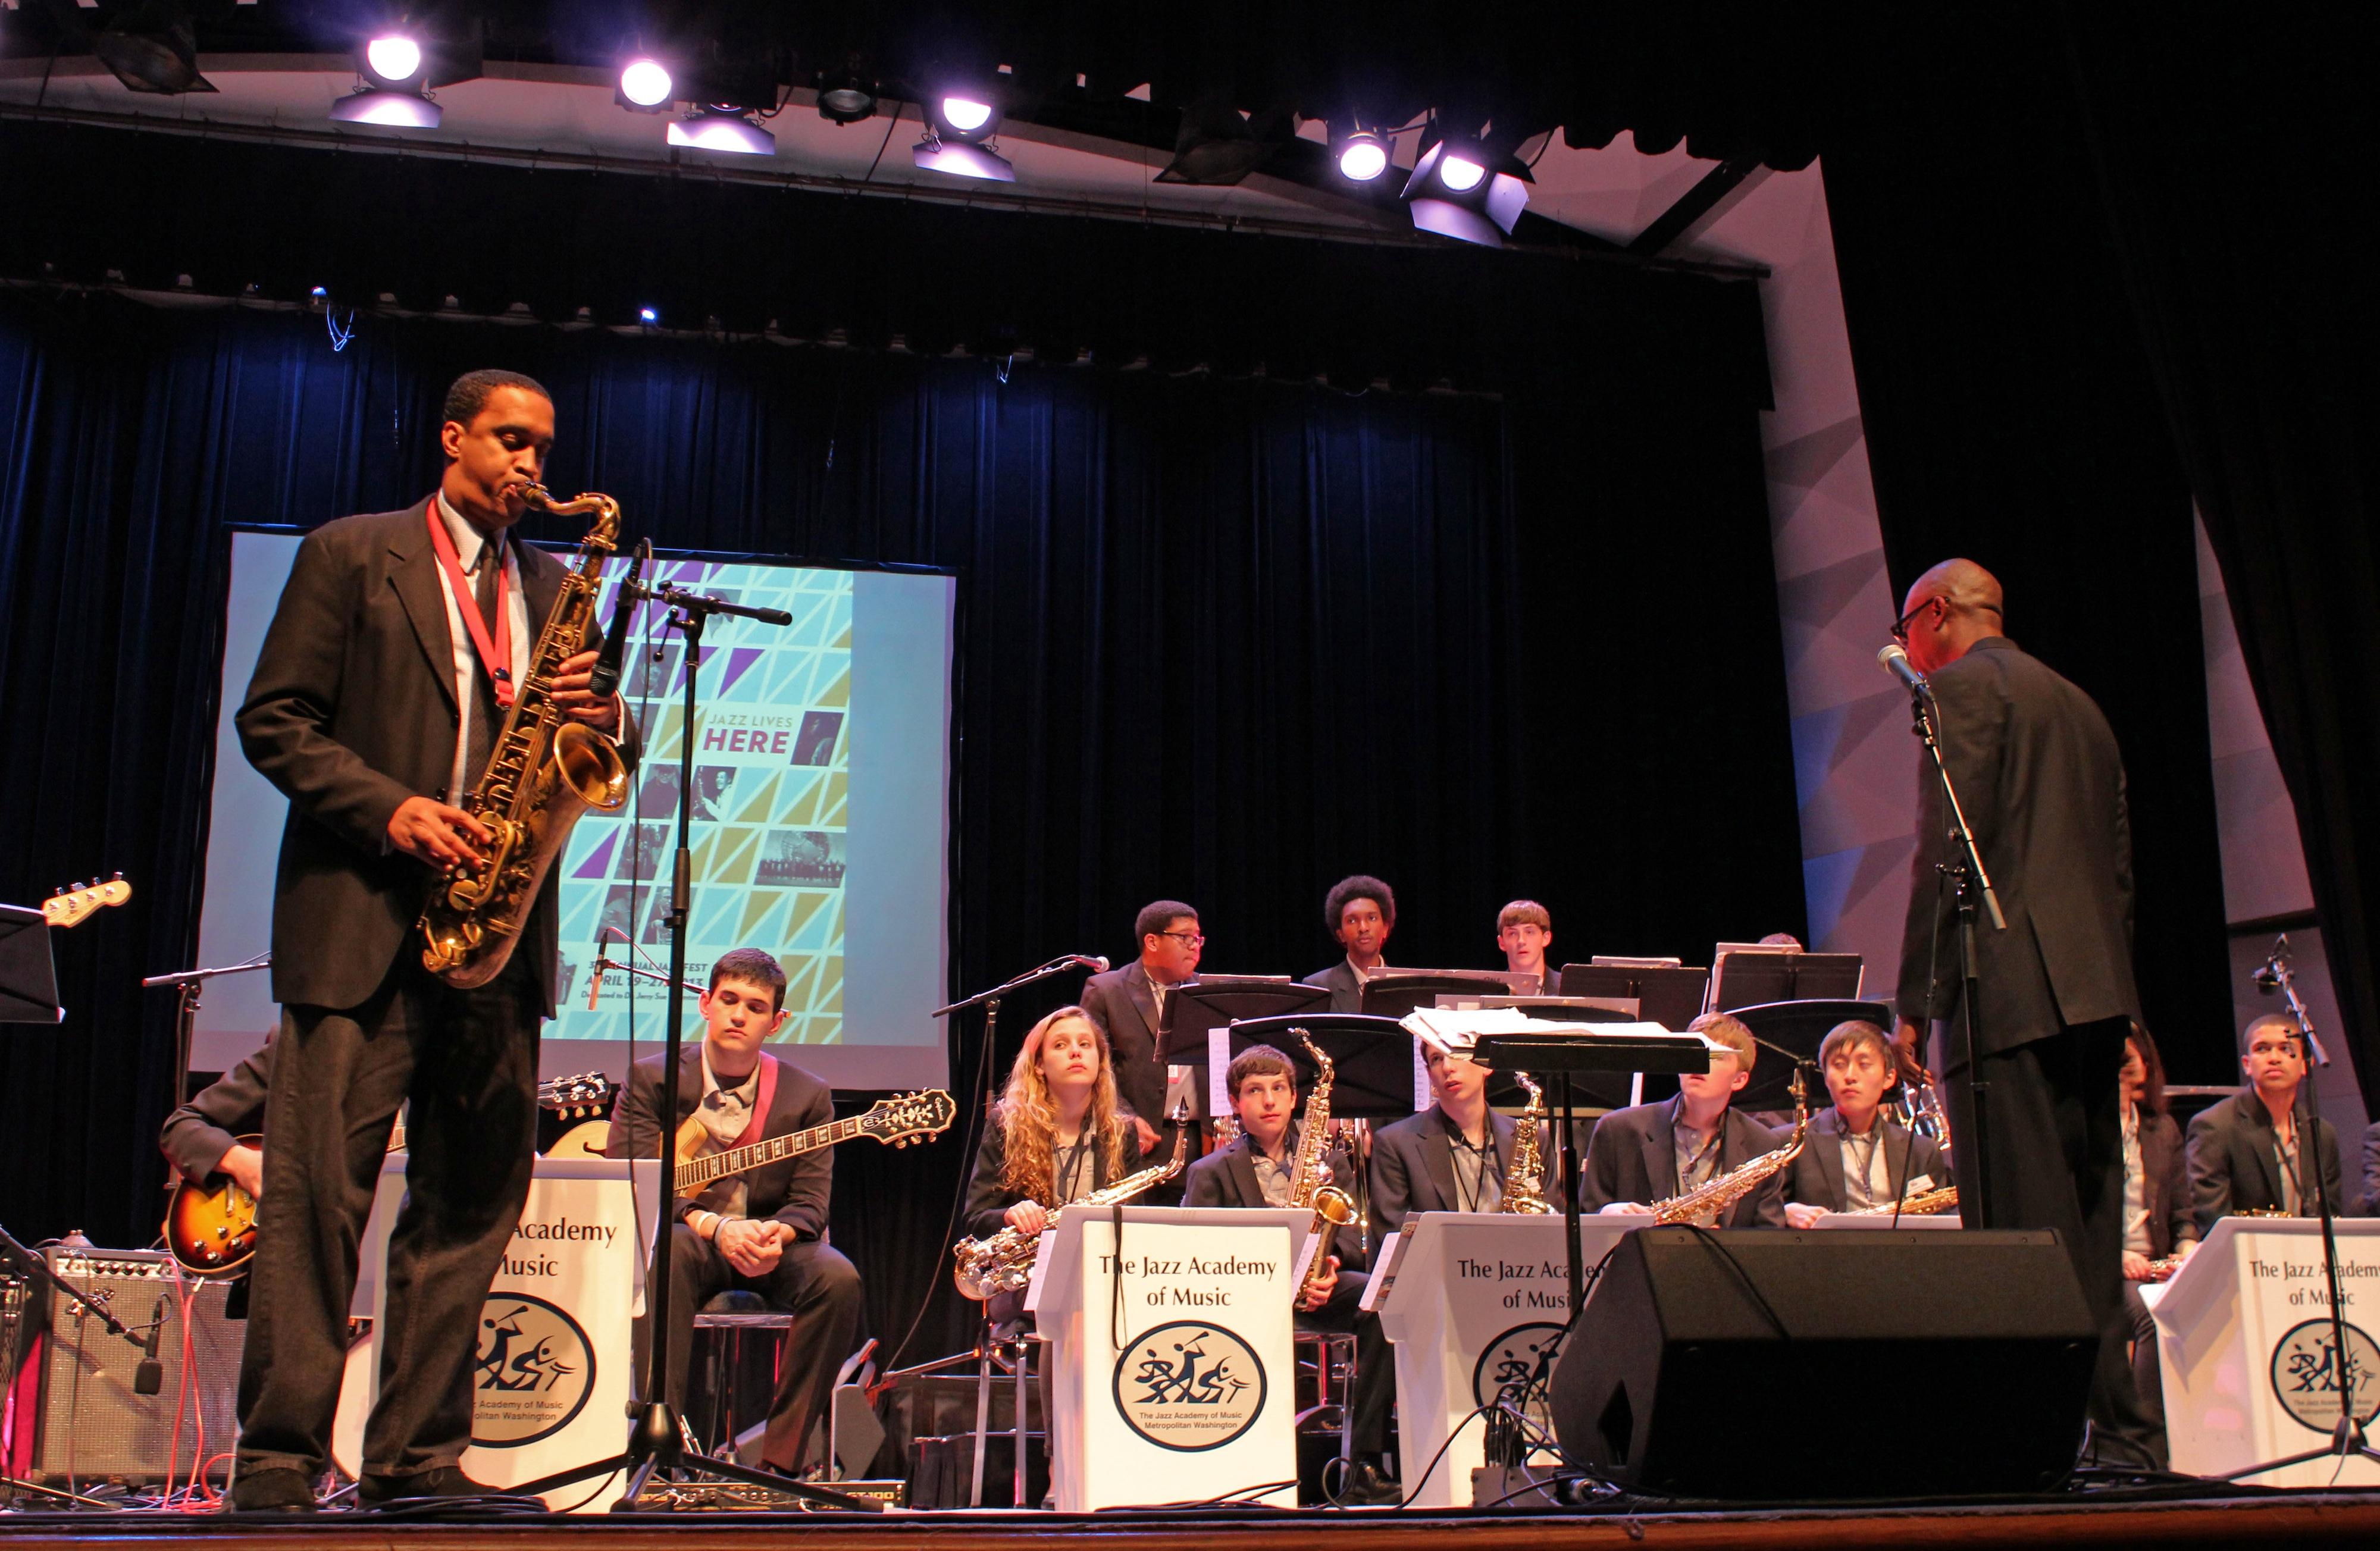 Javon jackson with the jazz academy of music